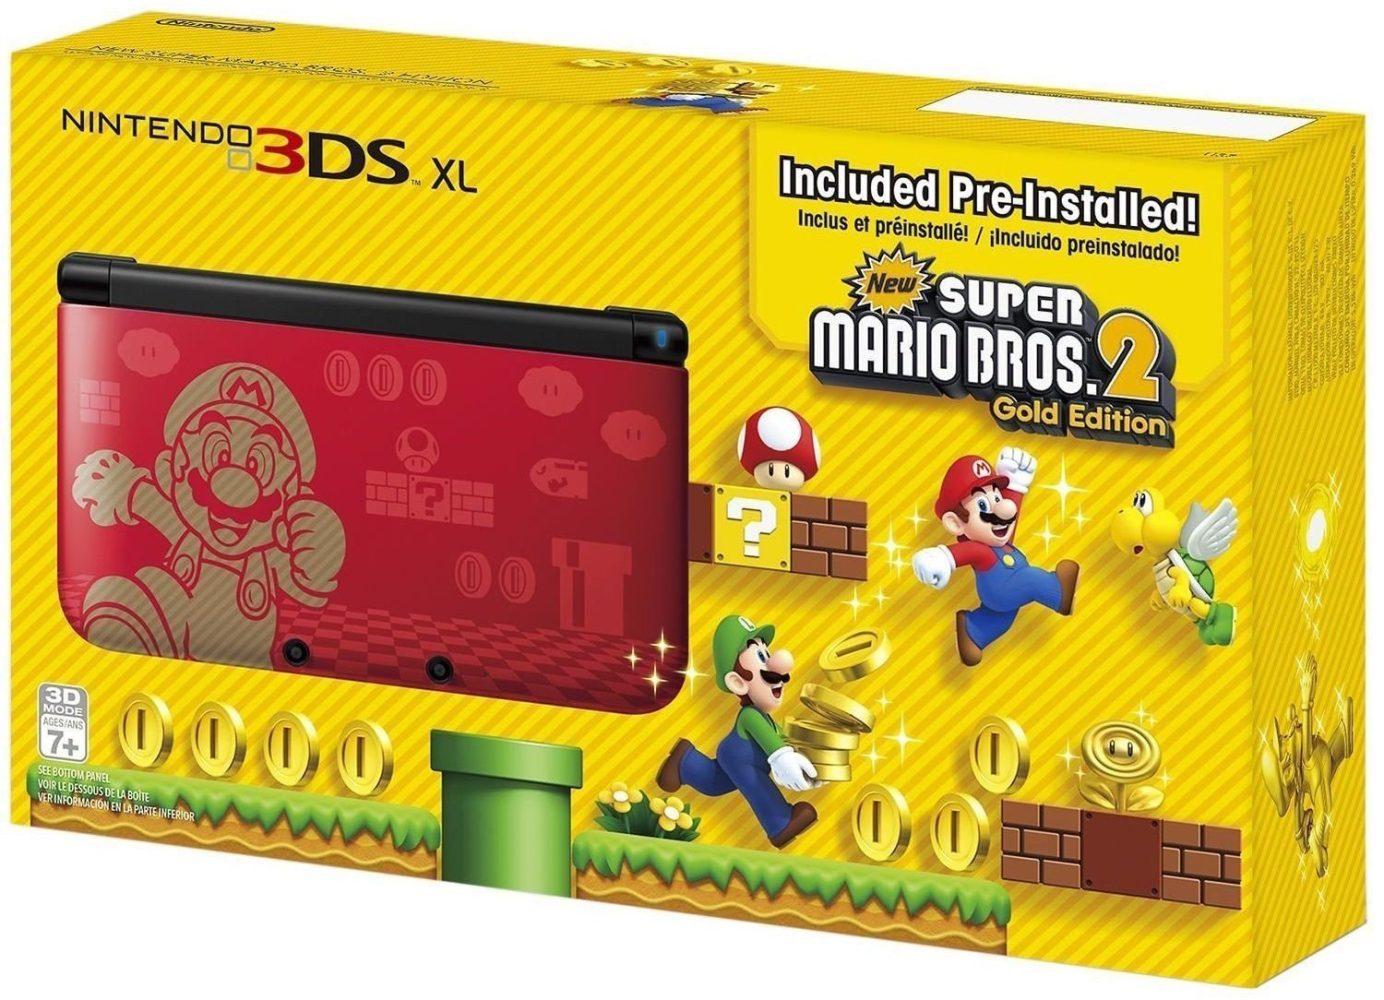 Games/Apps: Nintendo 3DS XL Super Mario 2 Gold Edition $158 (Reg. $175), CameraBag 2 for Mac $10, freebies, more